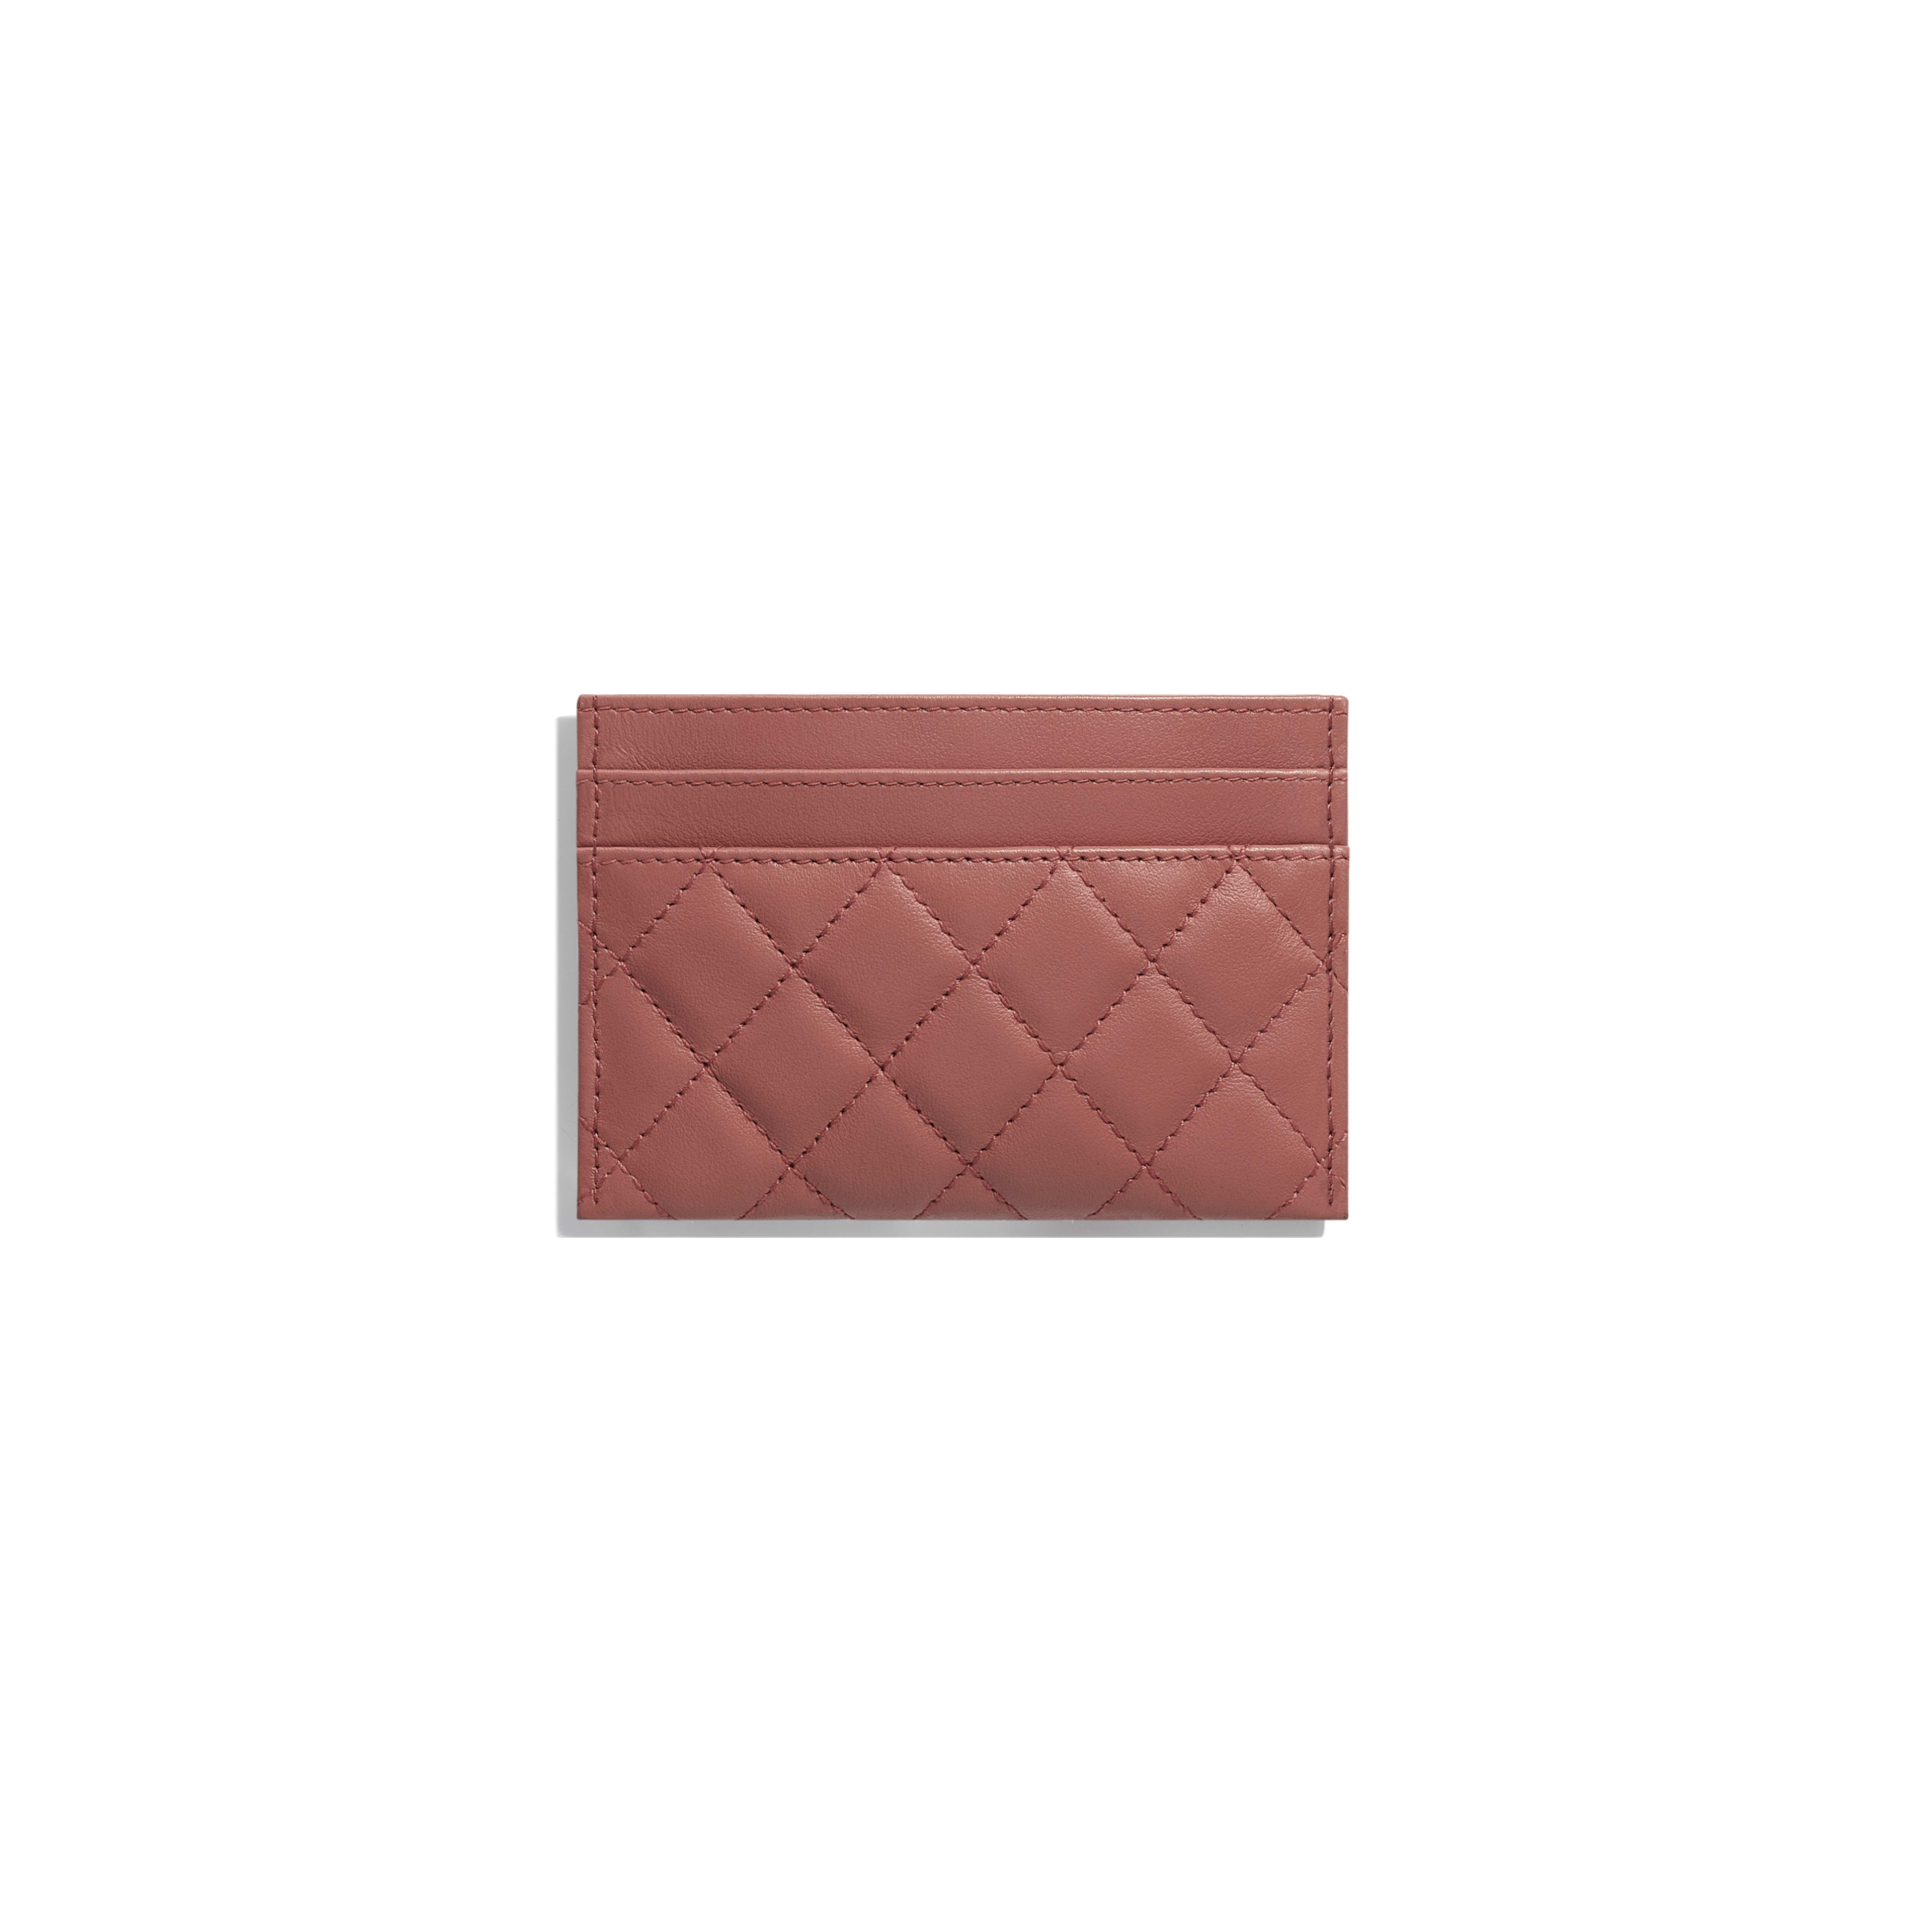 BOY CHANEL Card Holder - Dark Red - Calfskin & Gold-Tone Metal - Alternative view - see full sized version